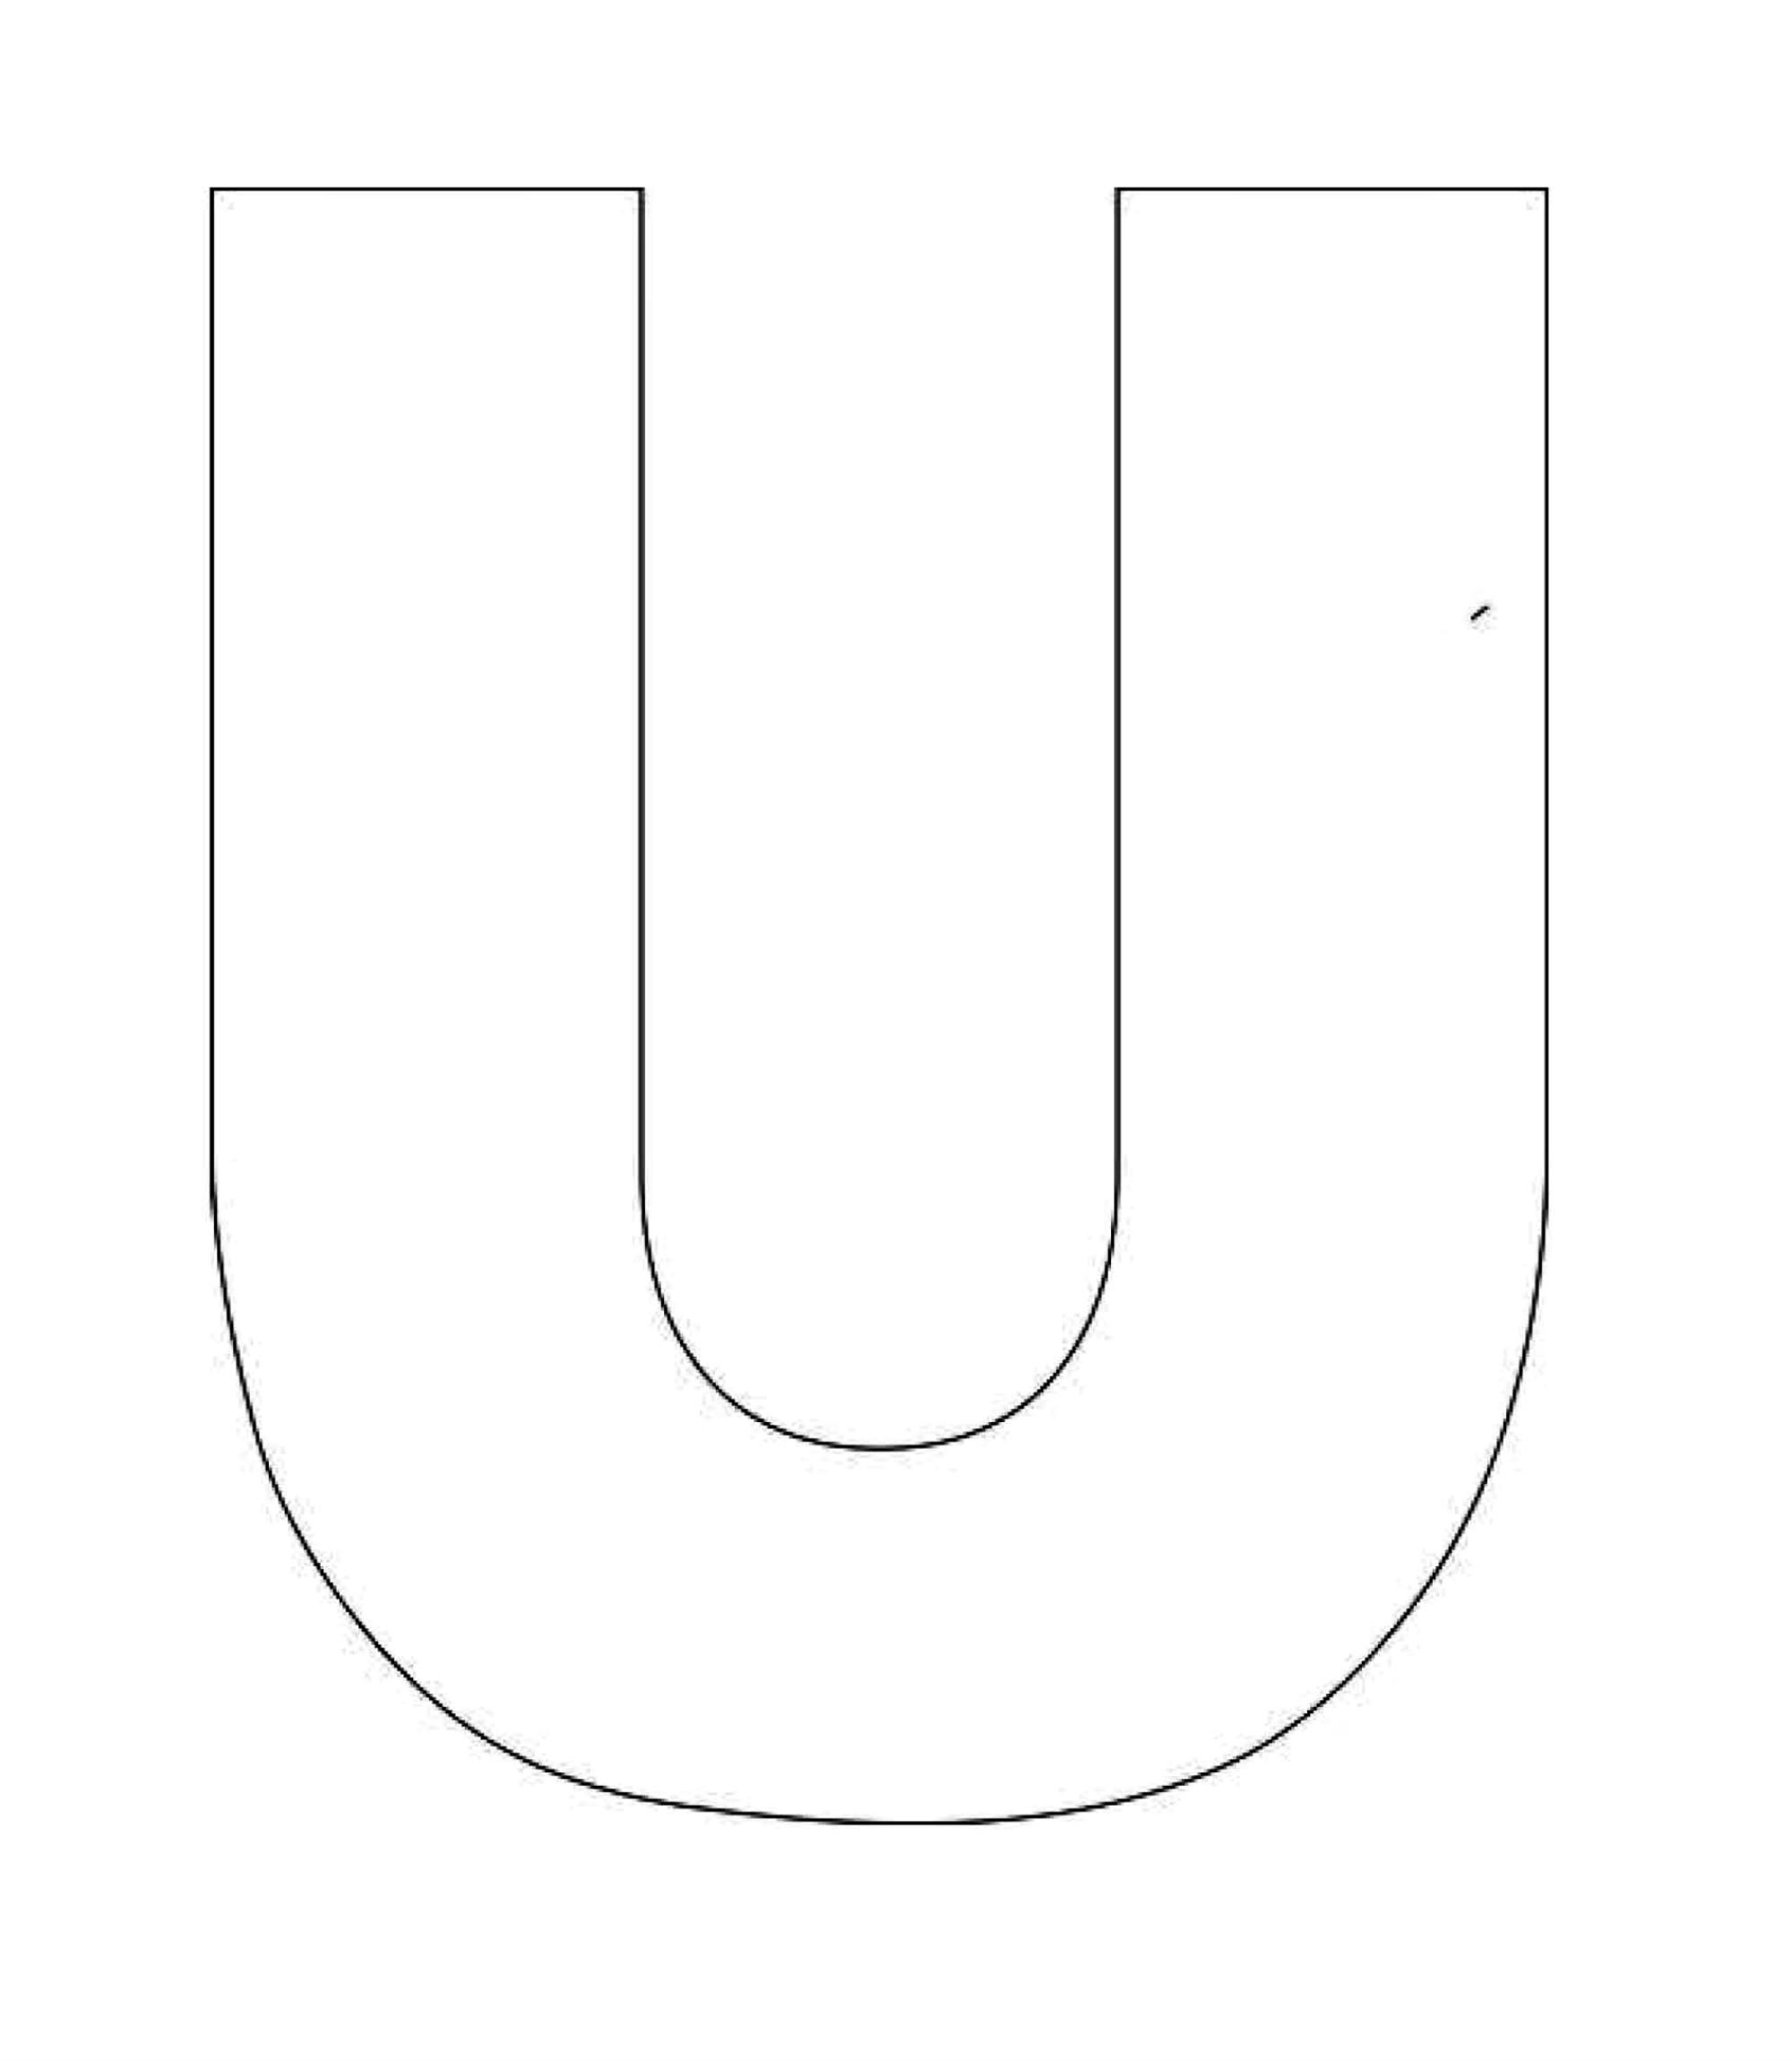 capital letter u template  Printable Alphabet Letter U Template! Alphabet Letter U ..